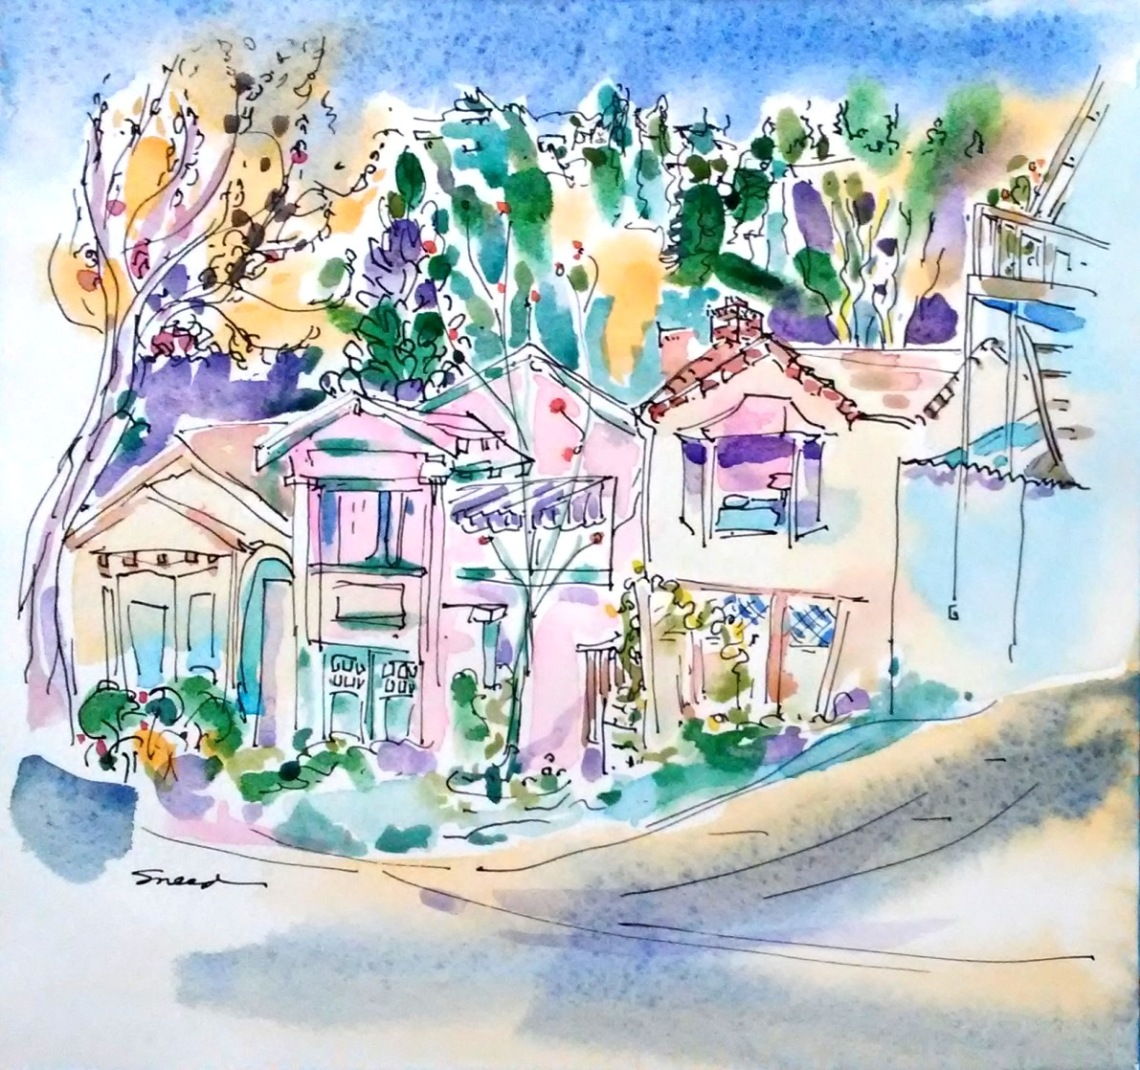 Neighbors, Santa Fe Avenue, Albany, Ink and Watercolor, 9 in x 9.5 in, 20181213.jpg